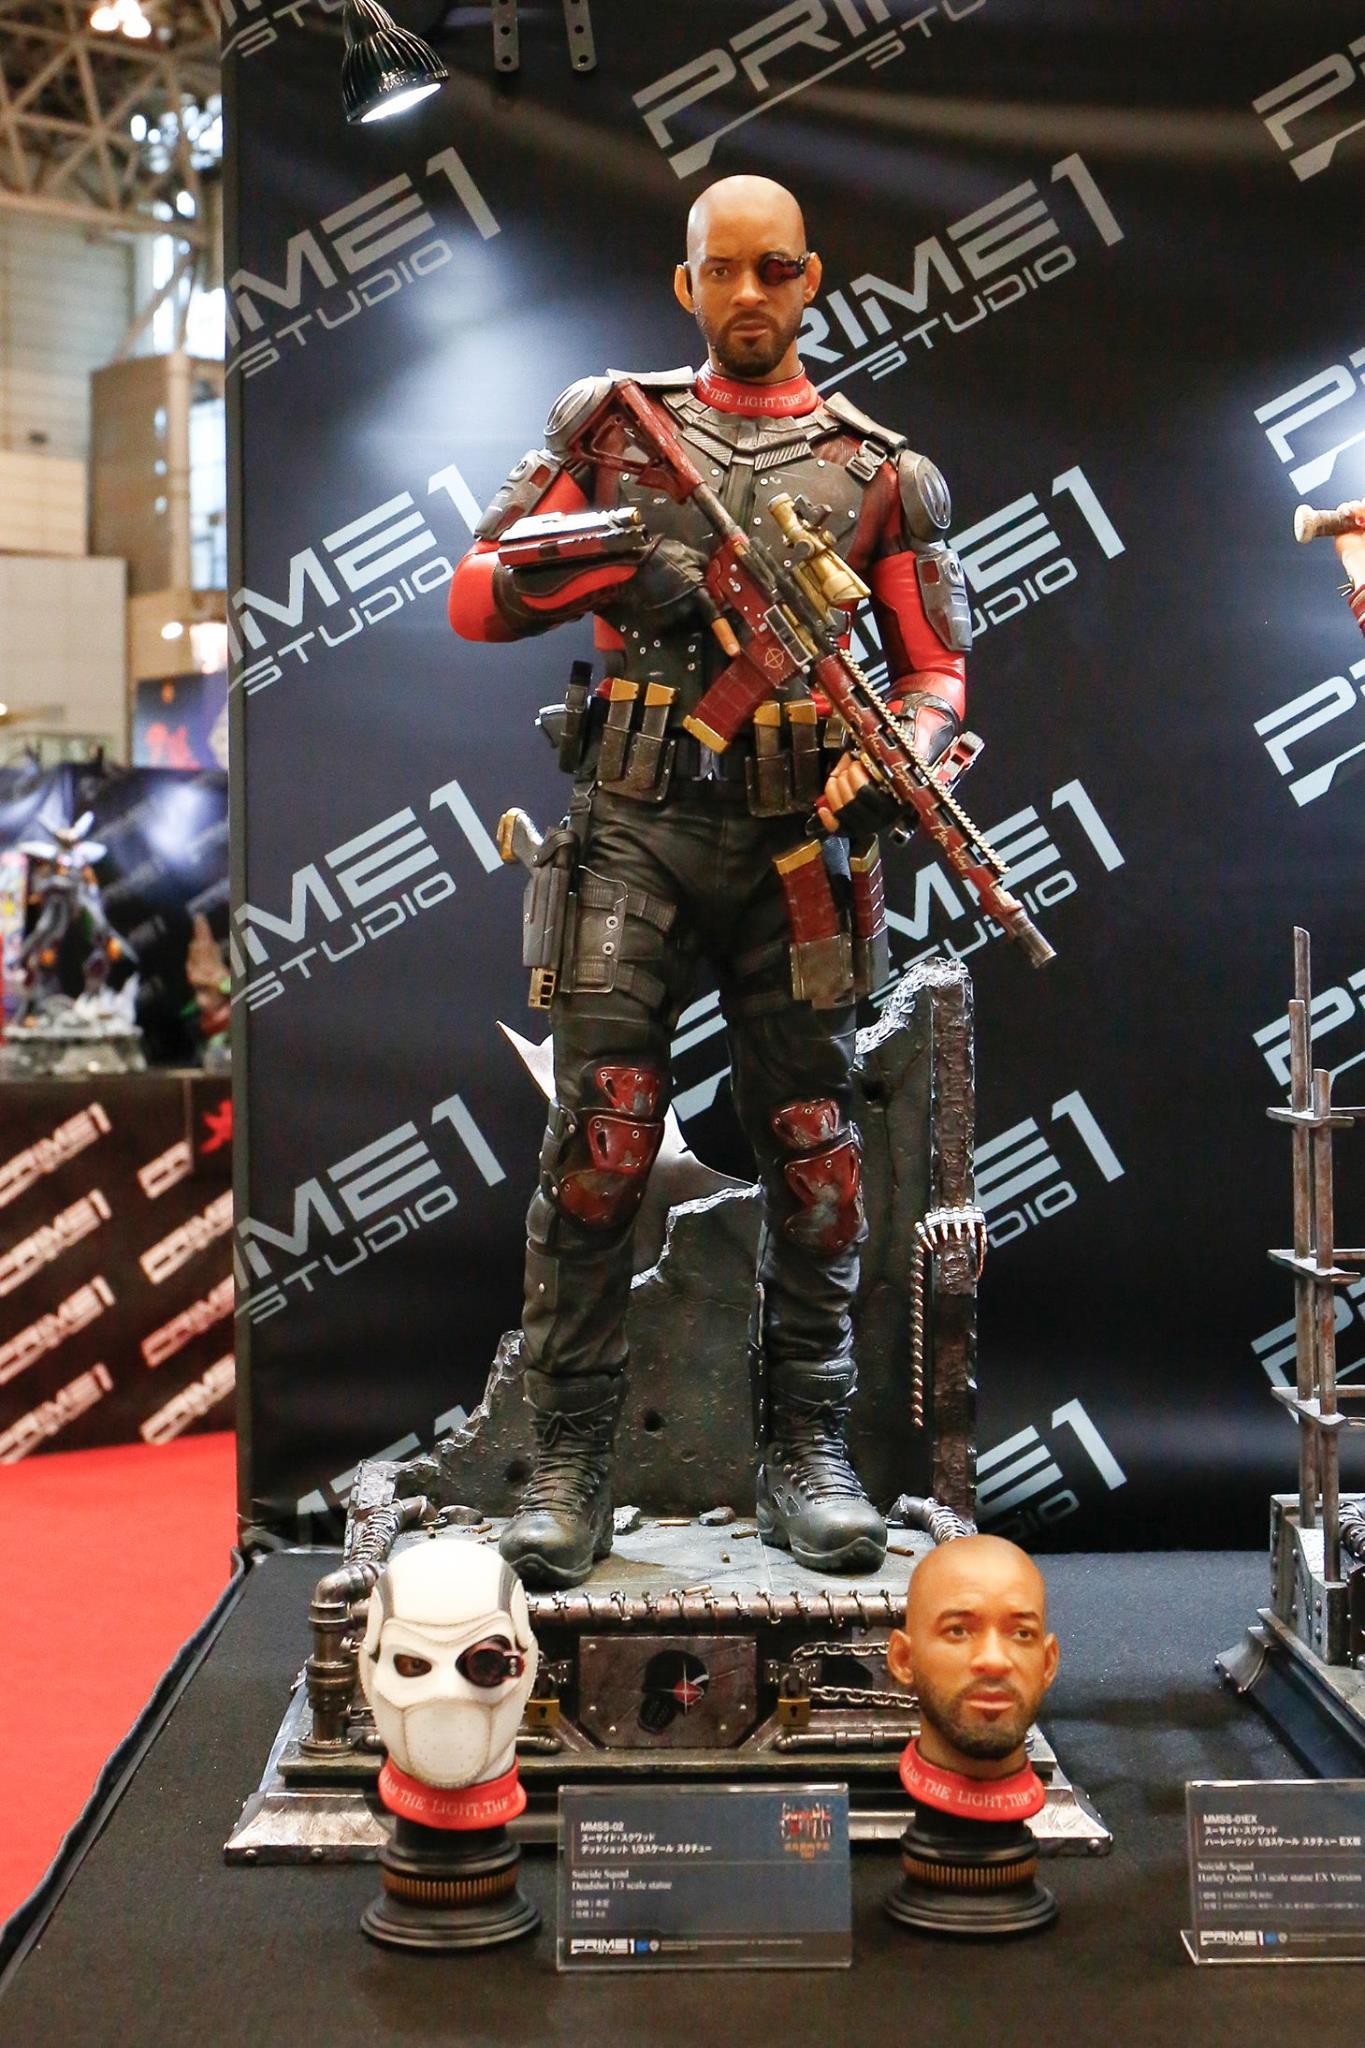 suicide-squad-deadshot-prime-1-studio-statue